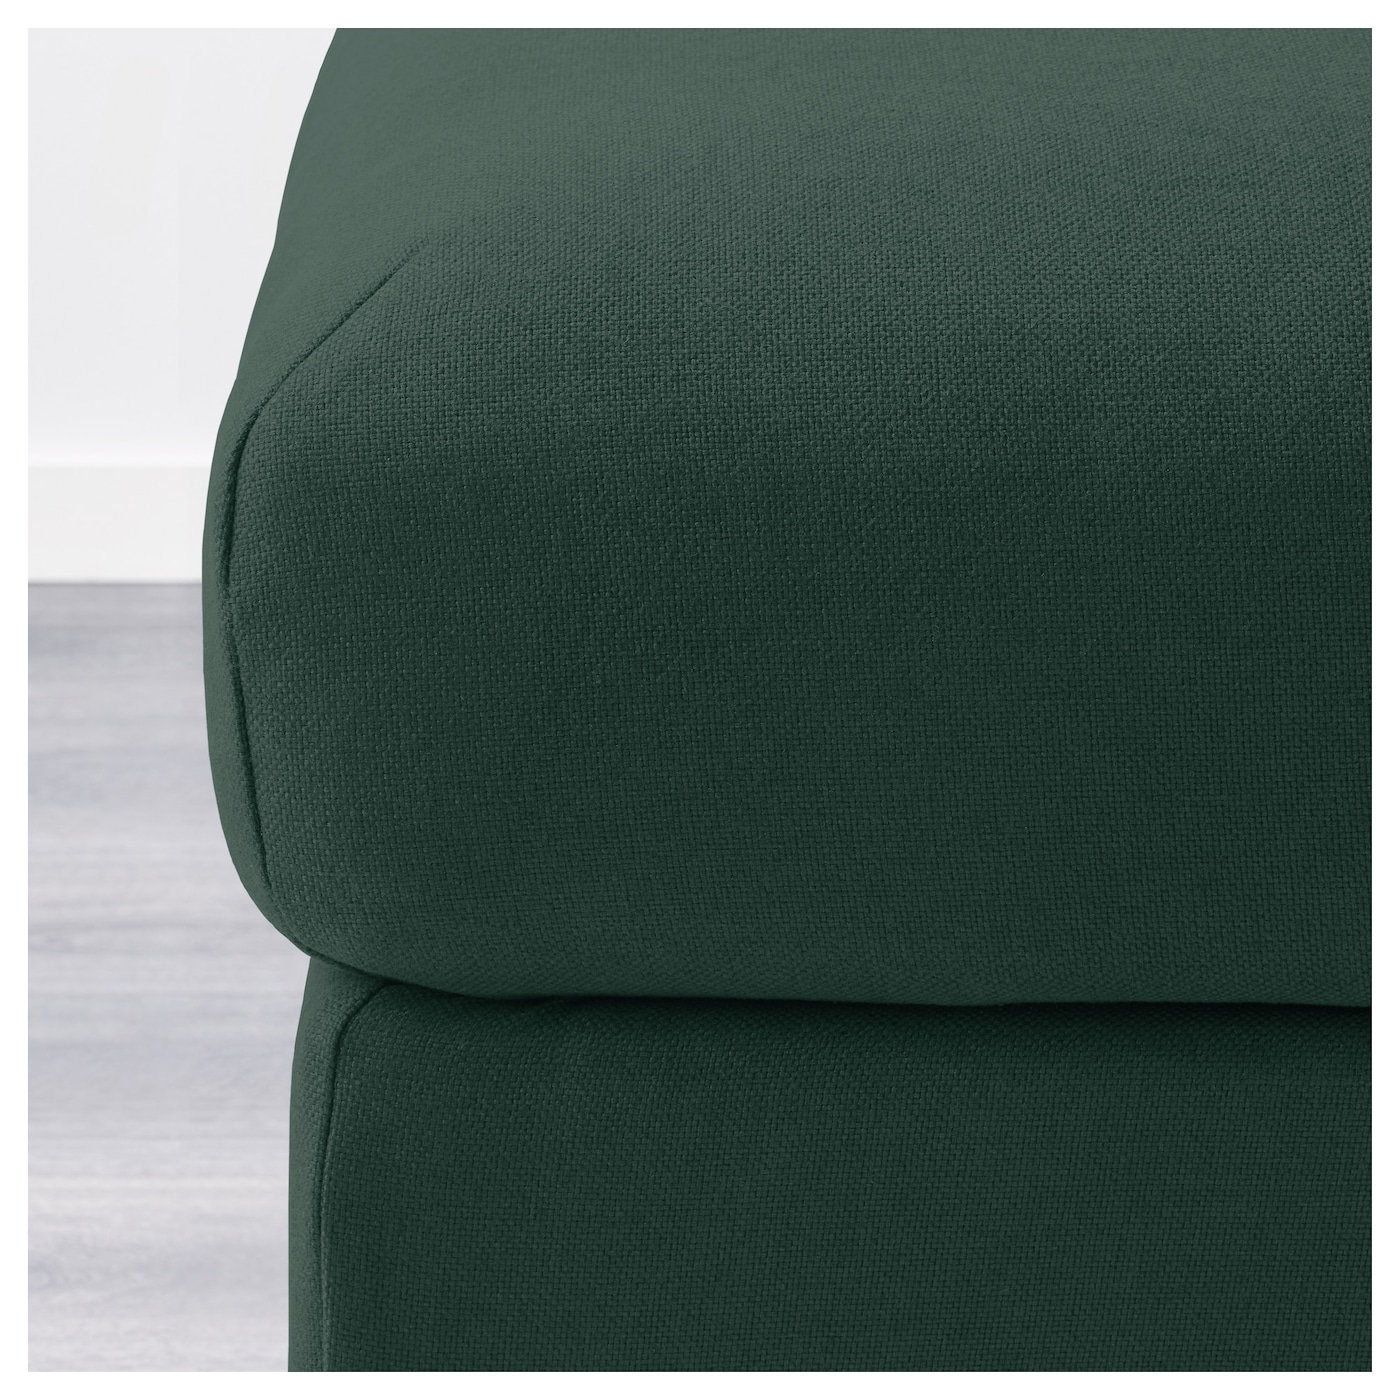 vimle repose pieds av rangement gunnared vert fonc ikea. Black Bedroom Furniture Sets. Home Design Ideas